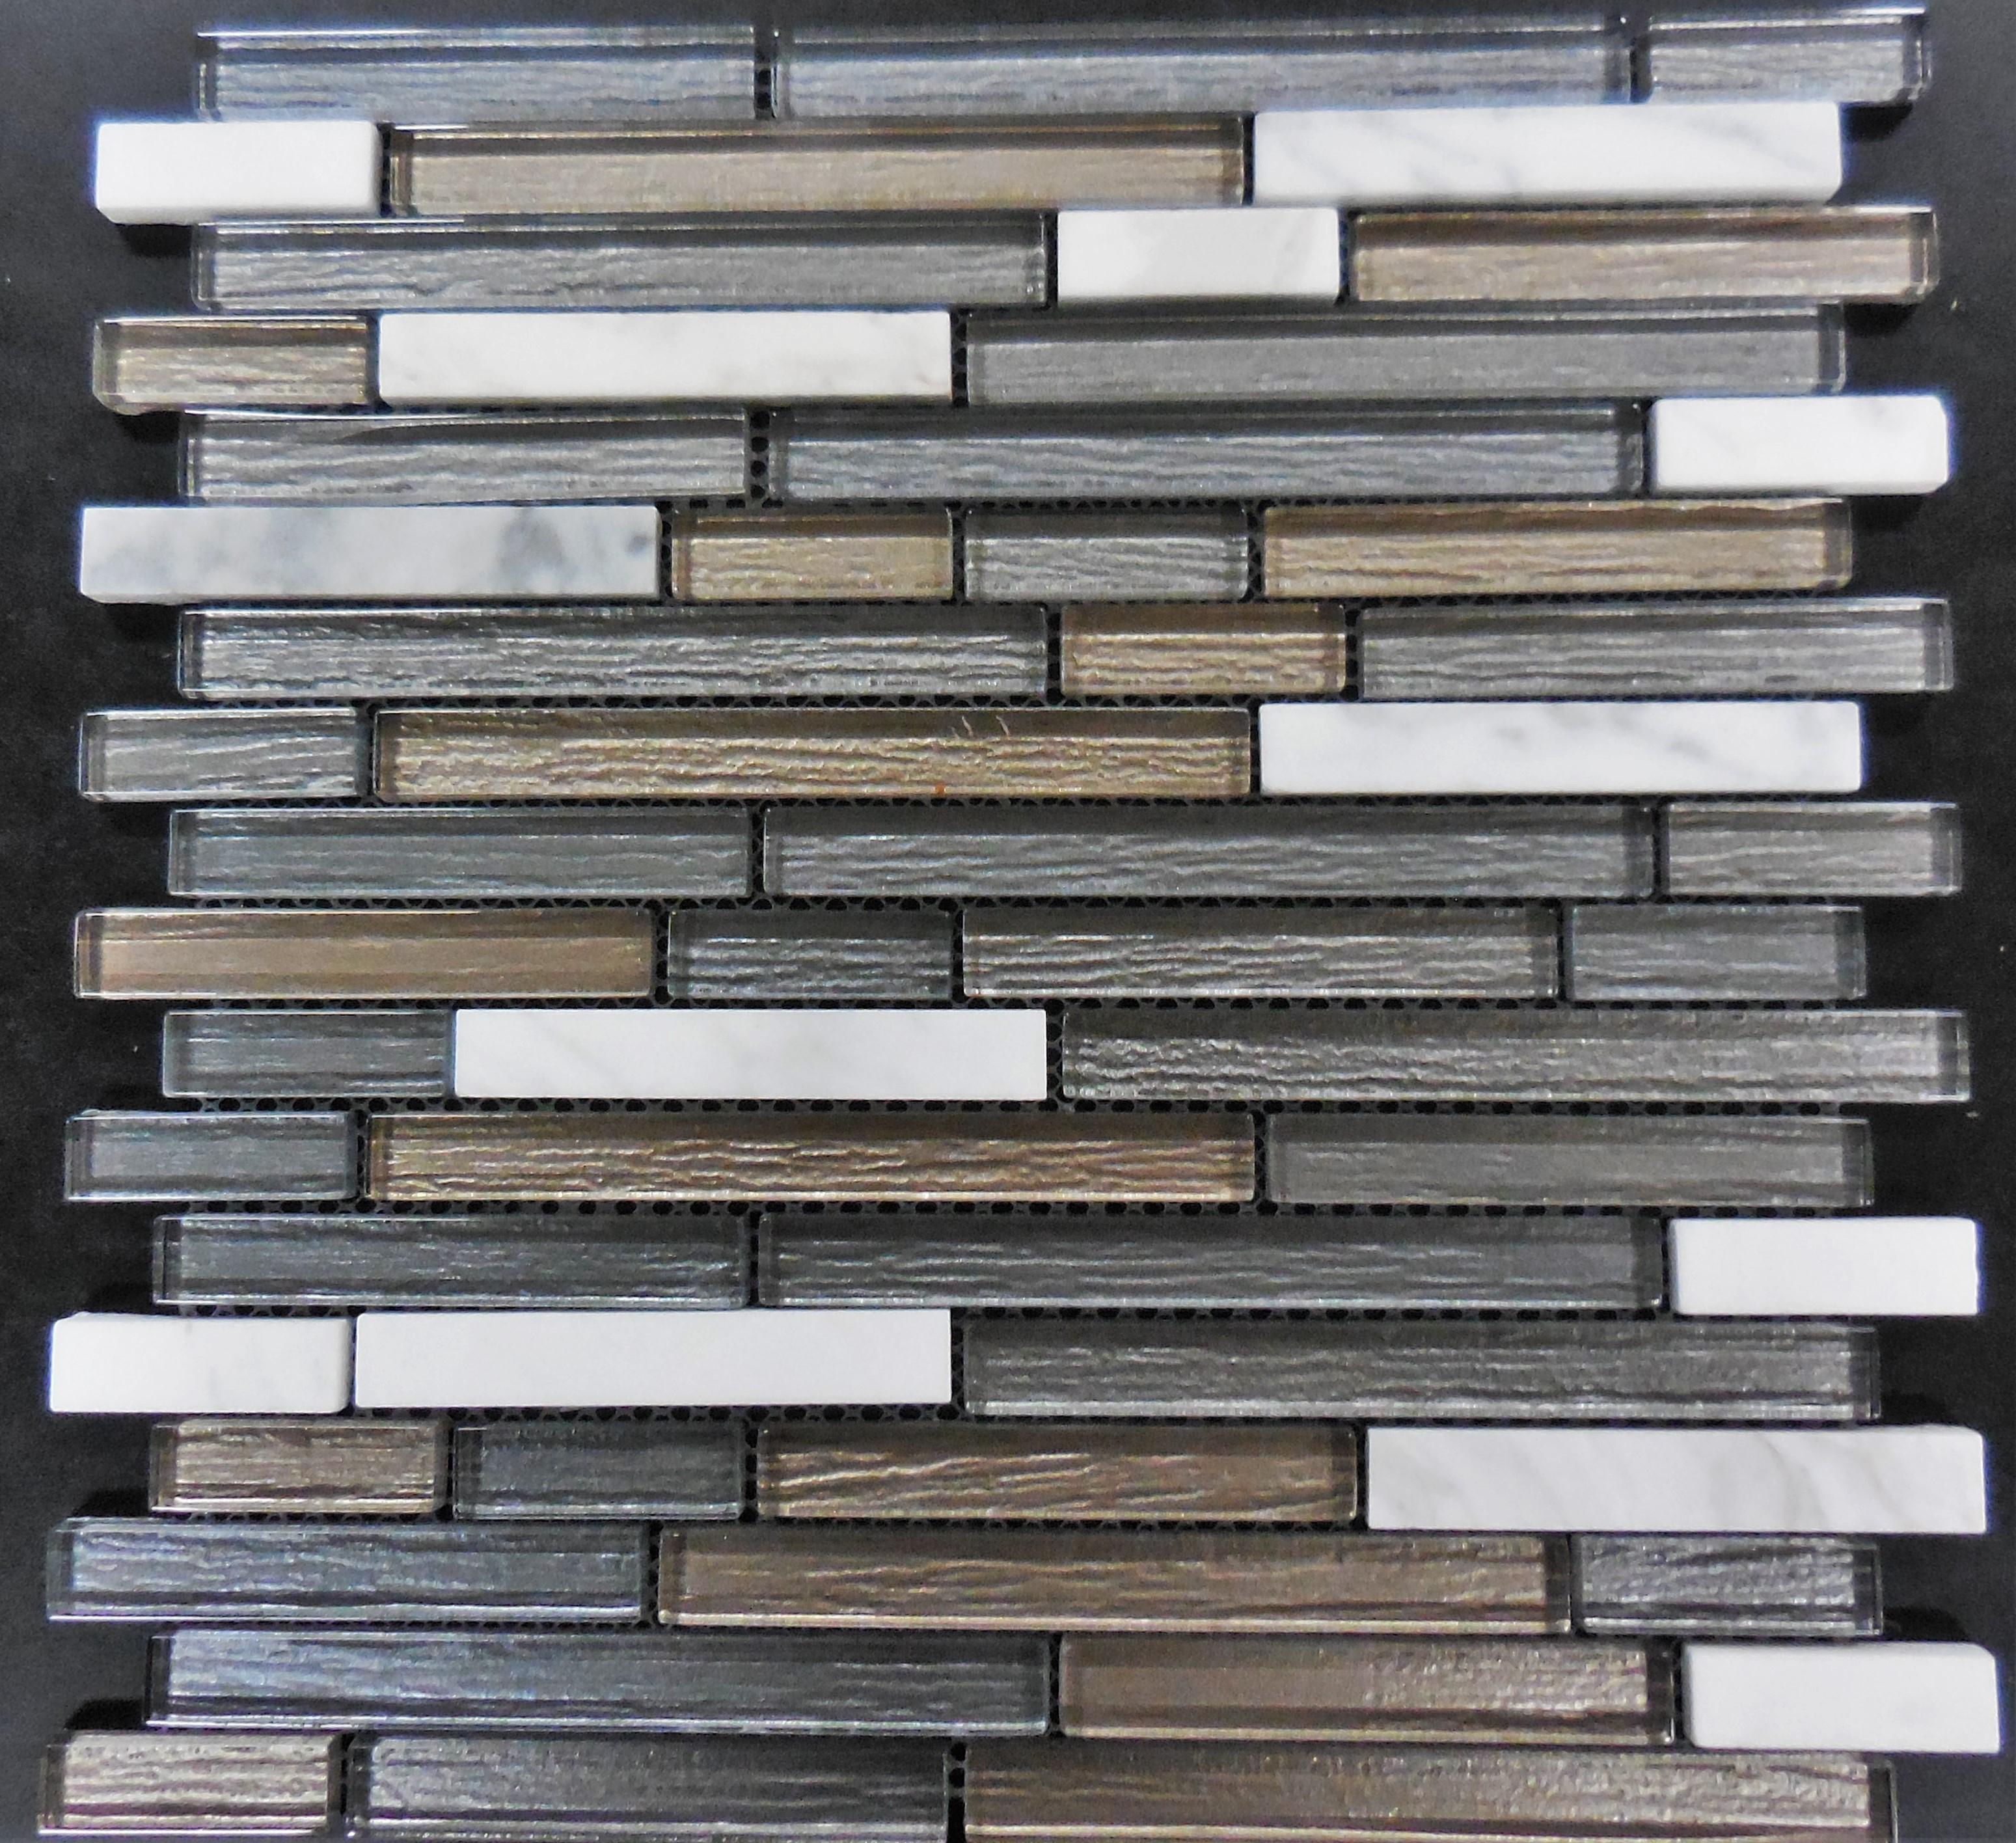 al785 stone brick series random brick glass and stone glass tile